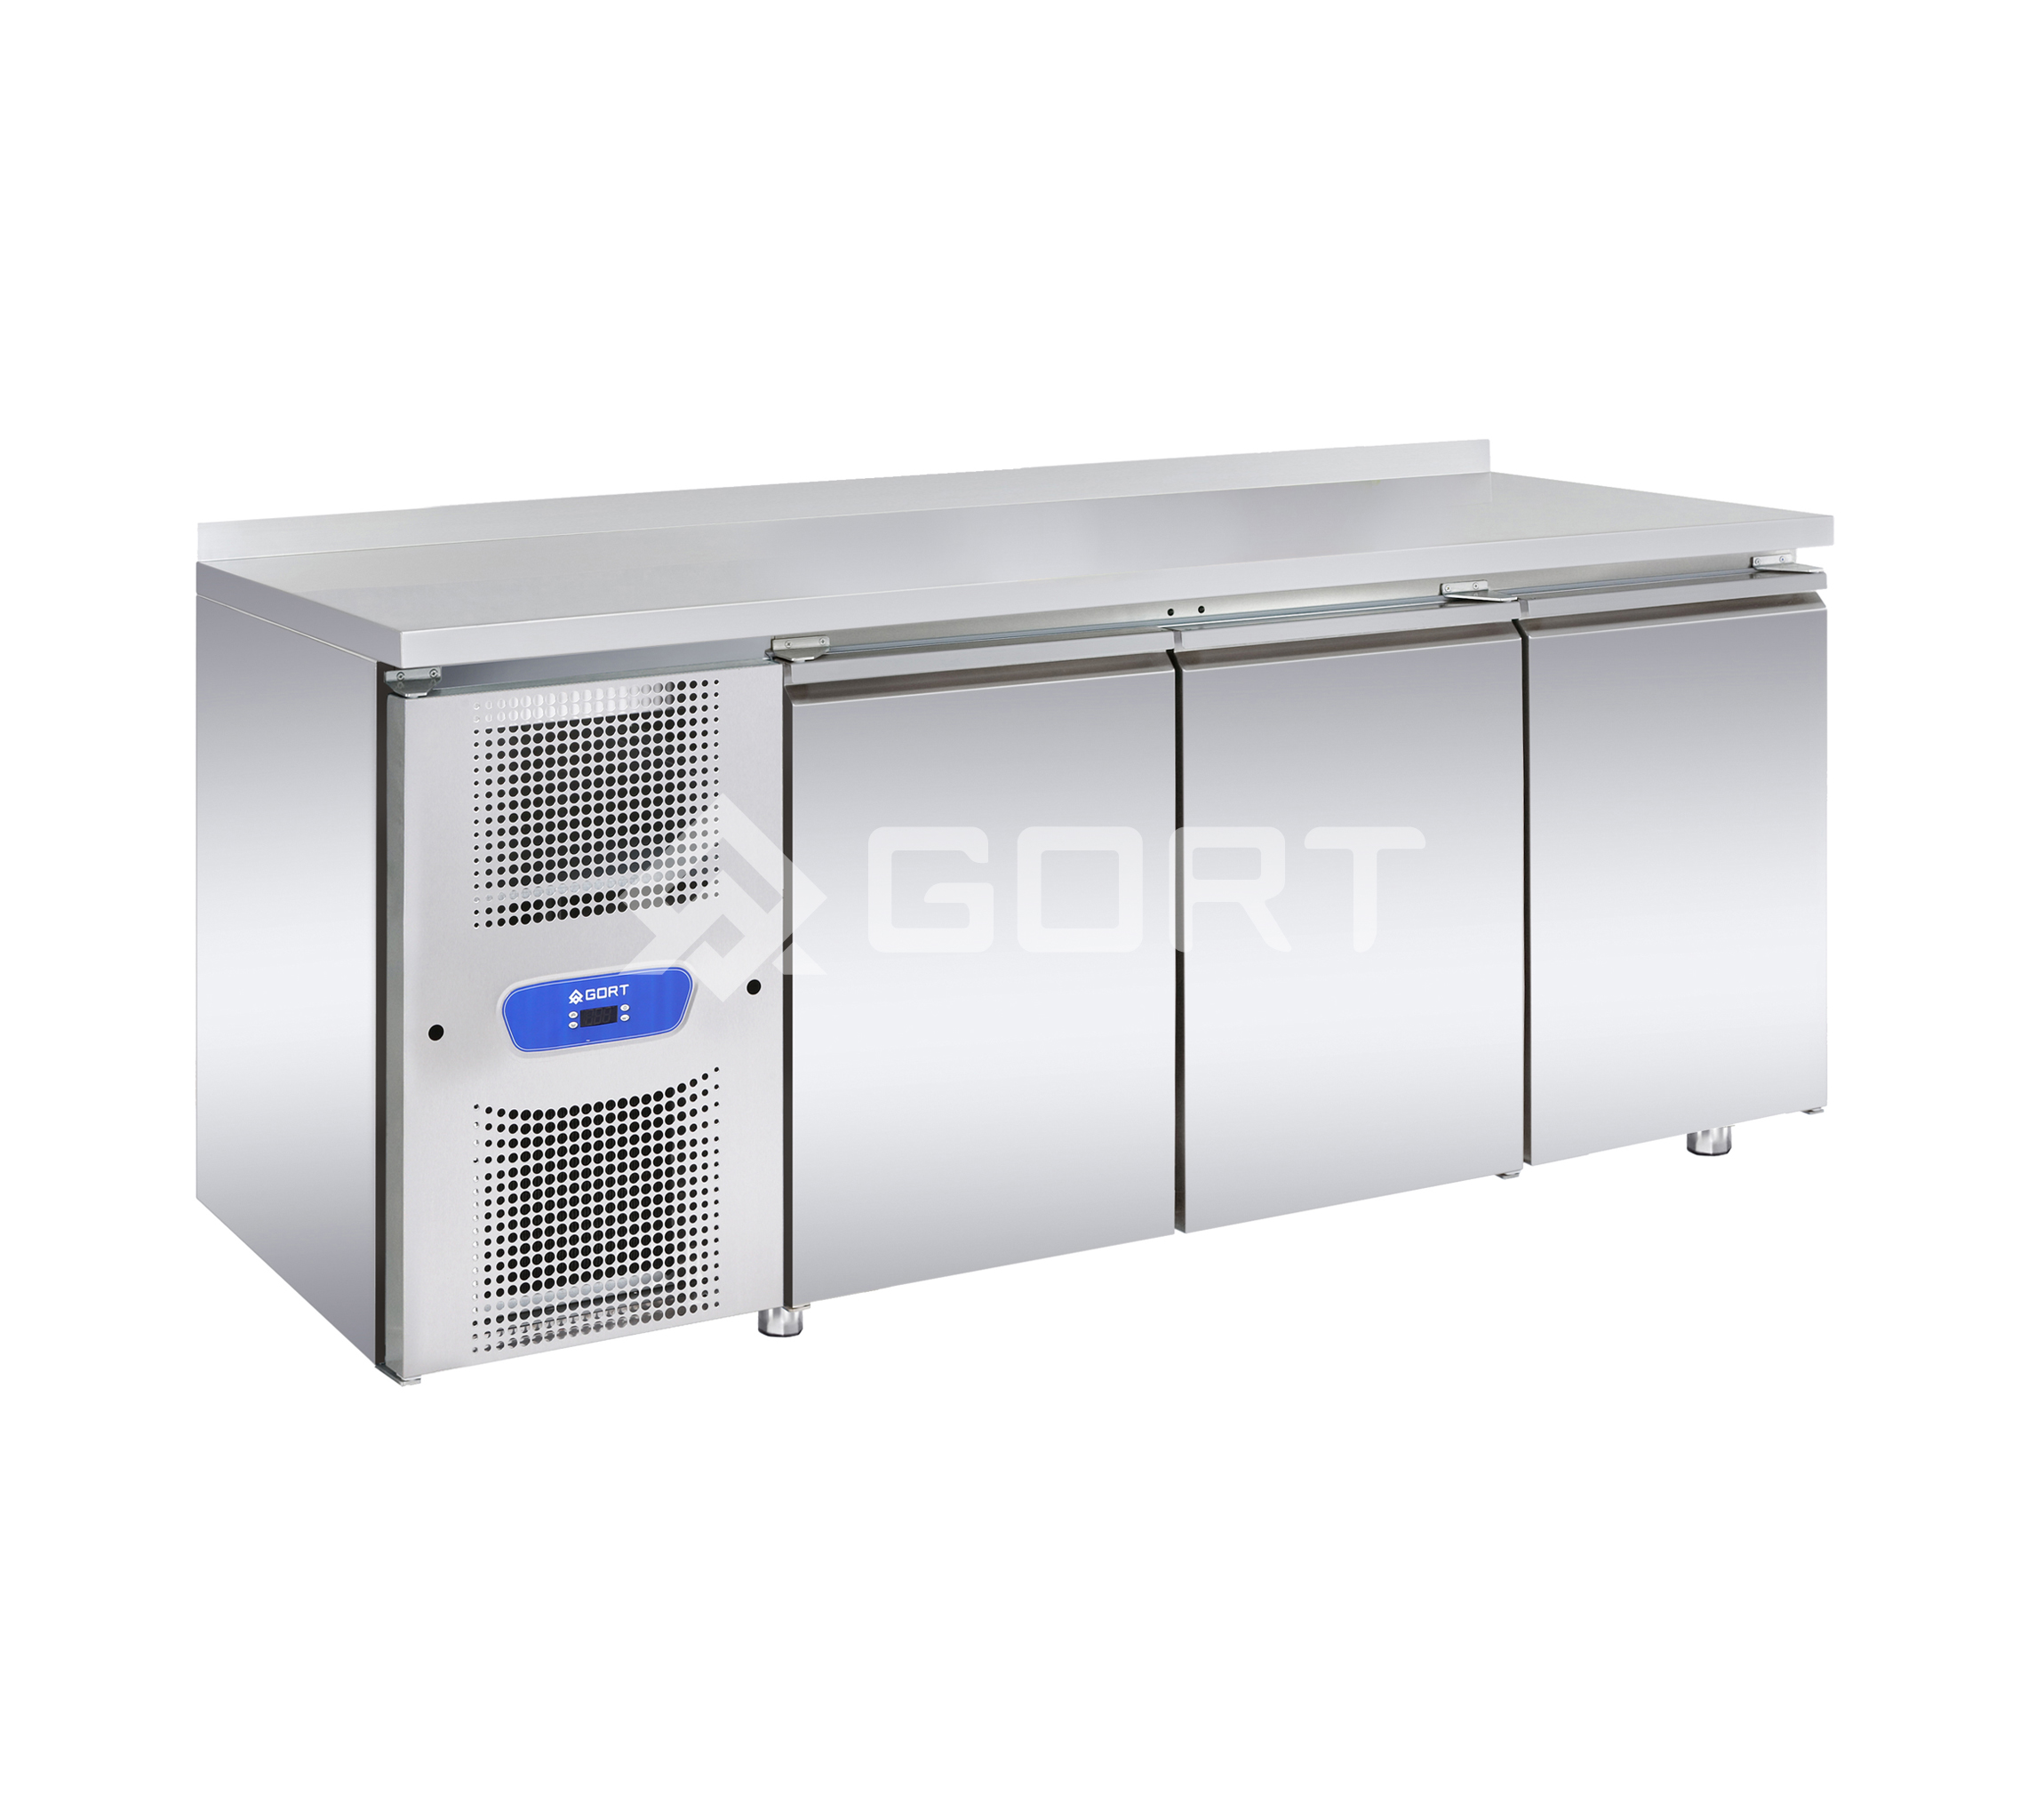 3 door refrigerated counter GN2/3